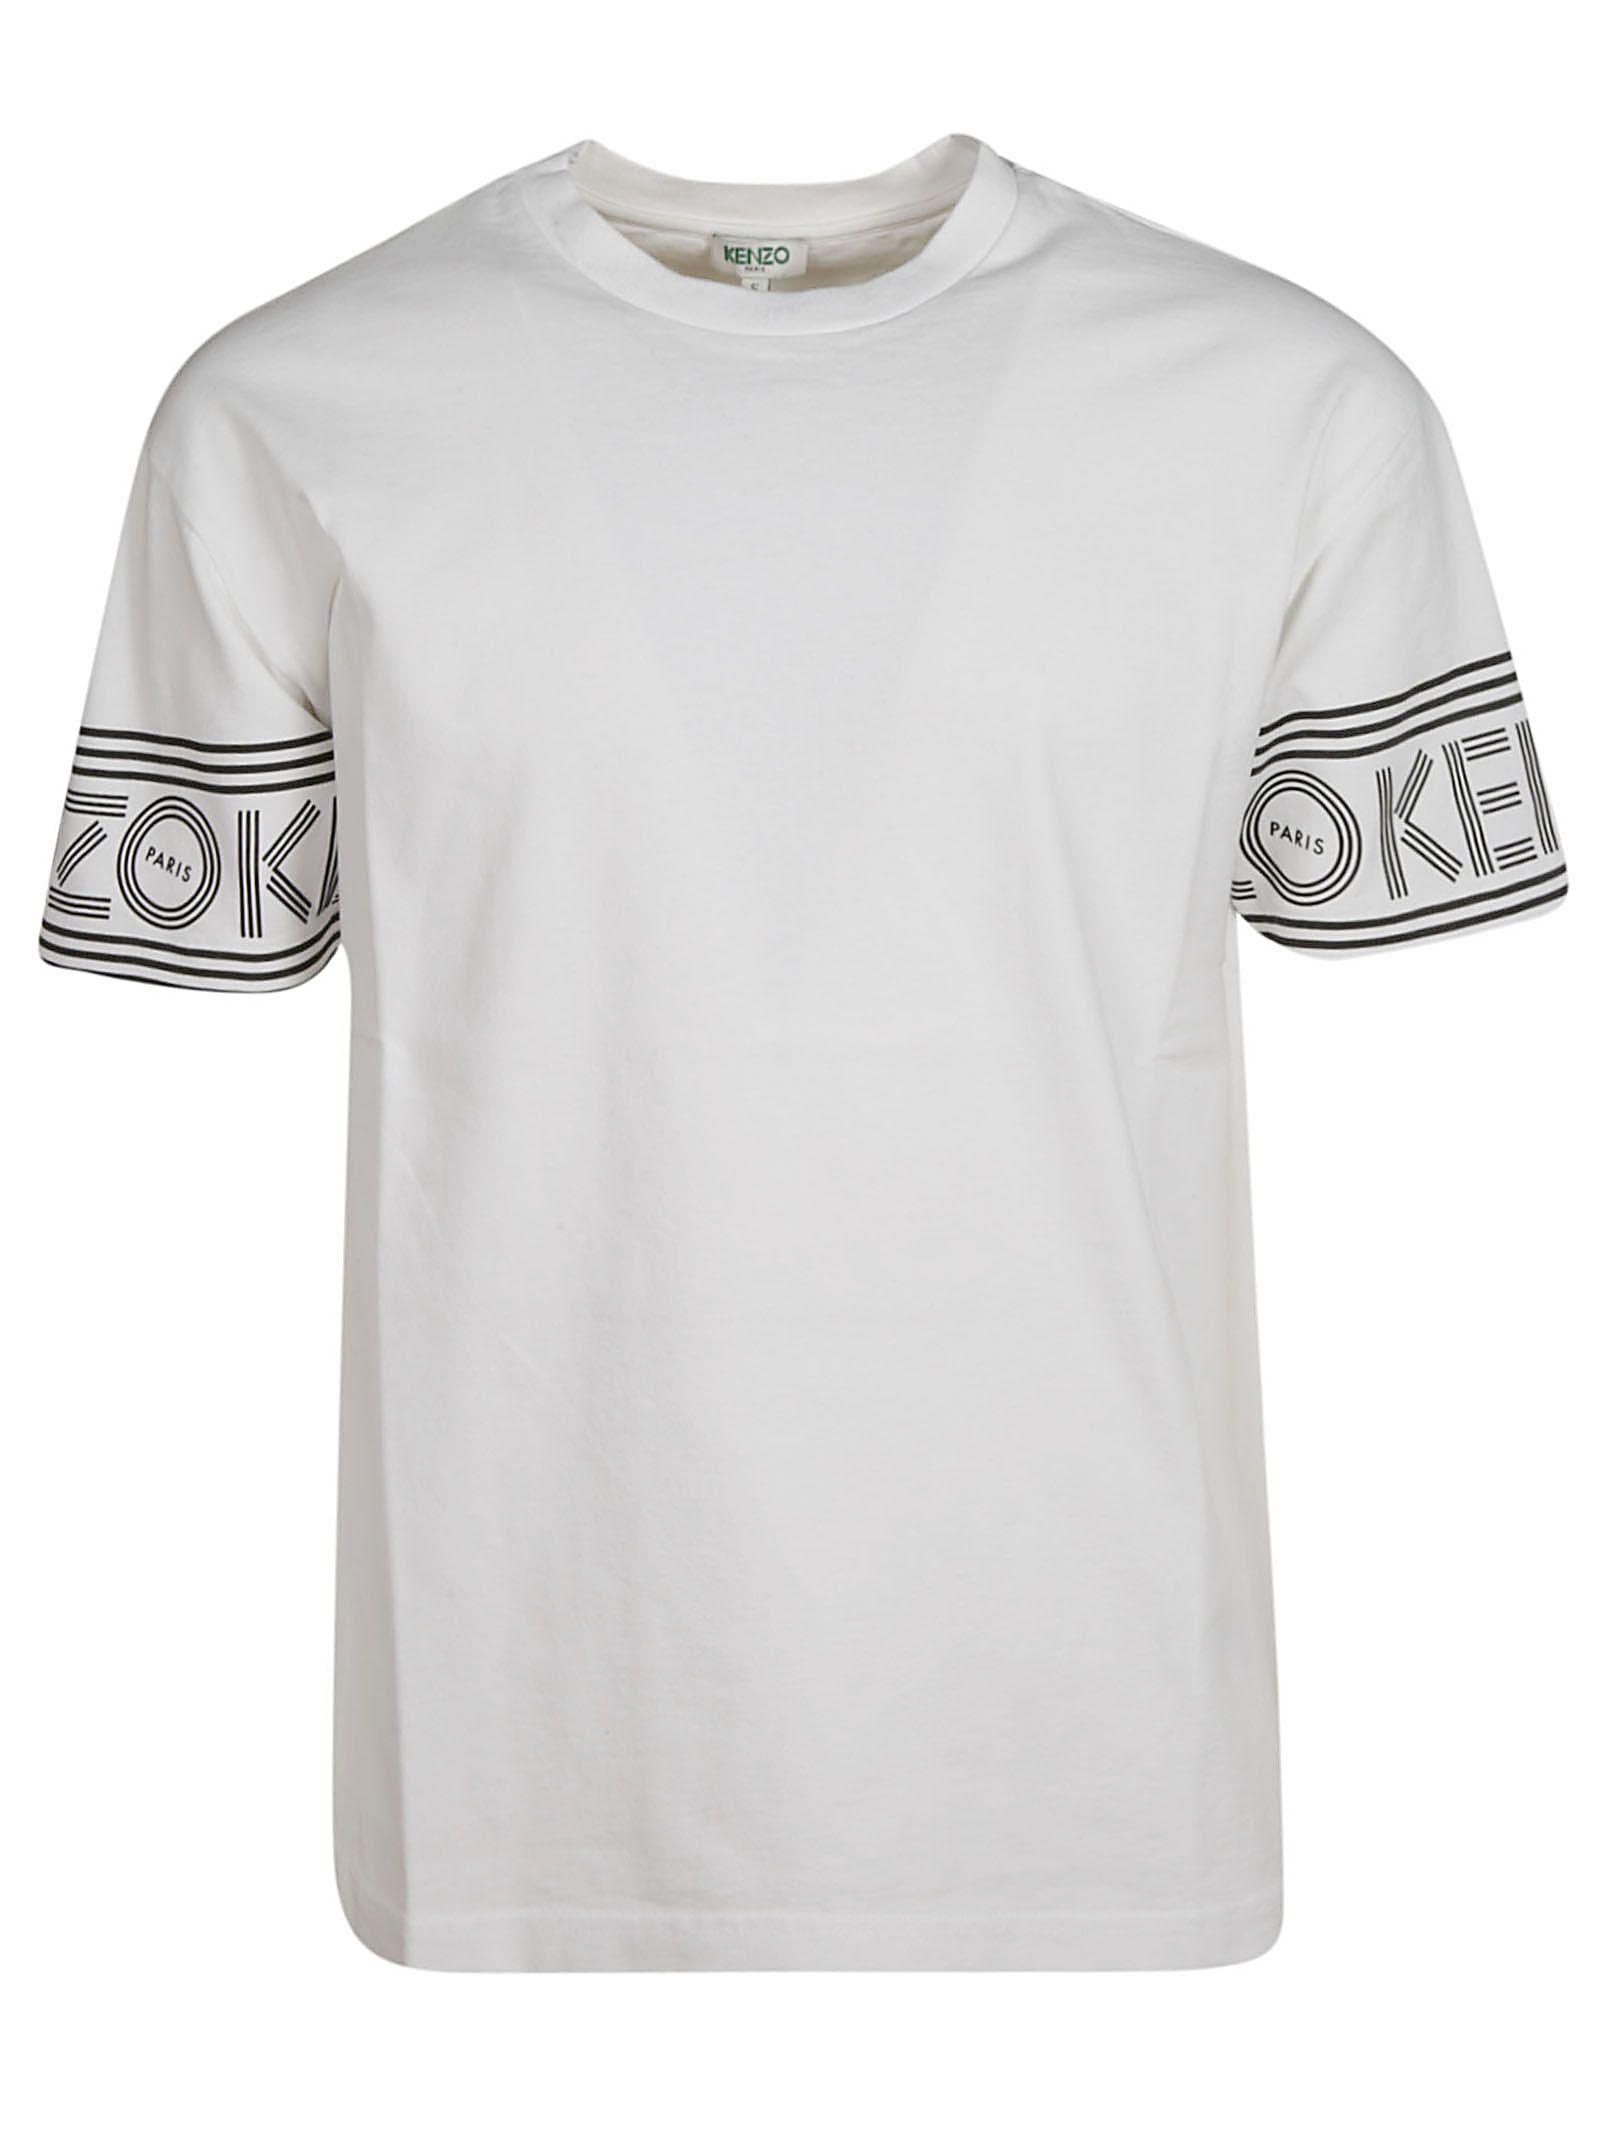 52d8aff2f Kenzo Kenzo Logo Print T-shirt - White - 10856134 | italist